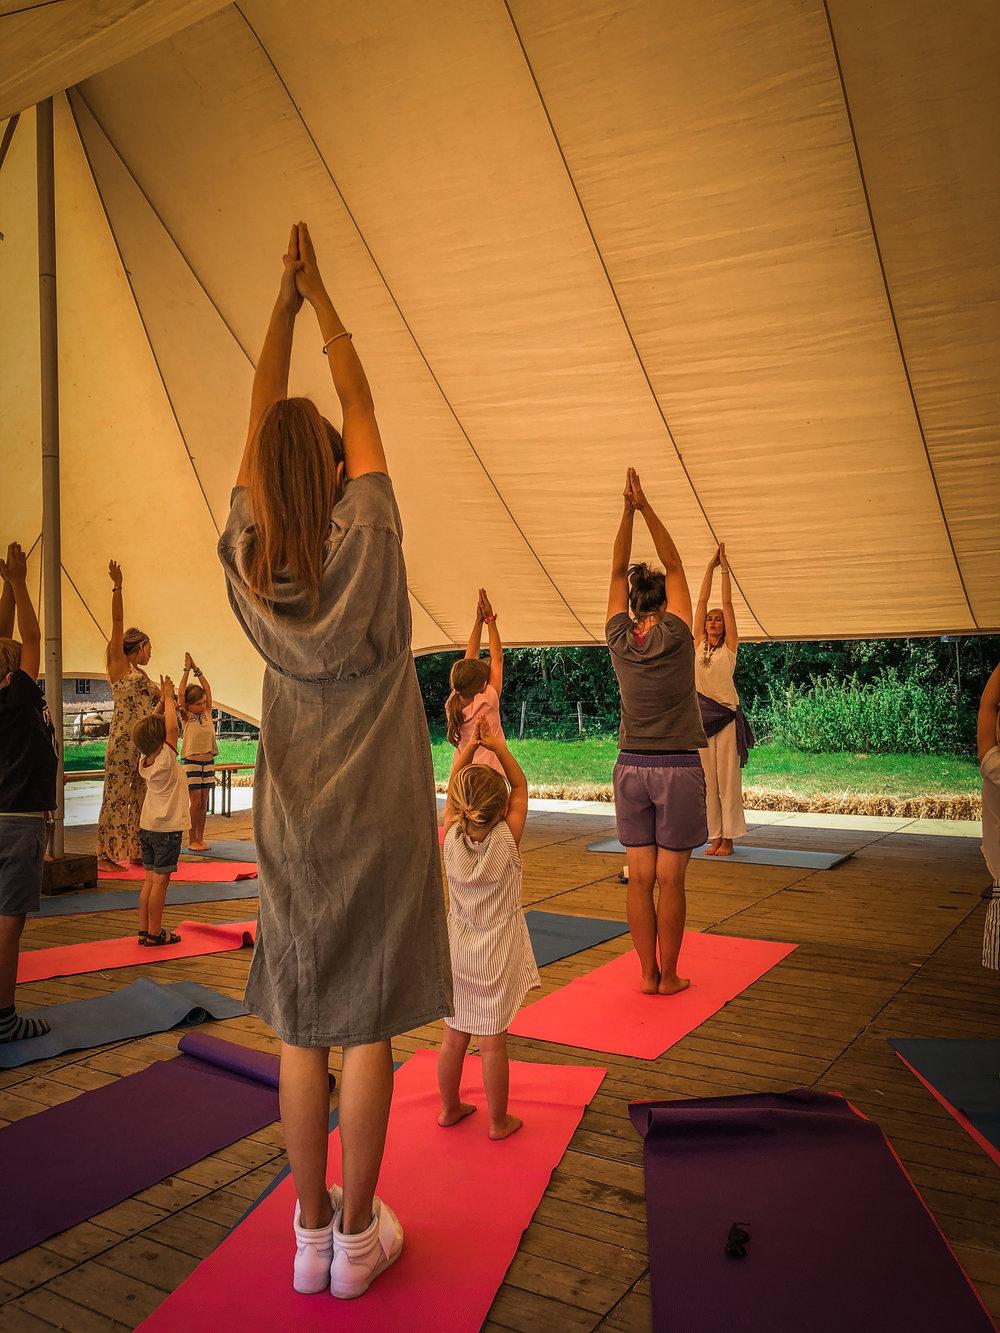 Bokrijk Zomerfestival - Dag uitstap - Familie Yoga